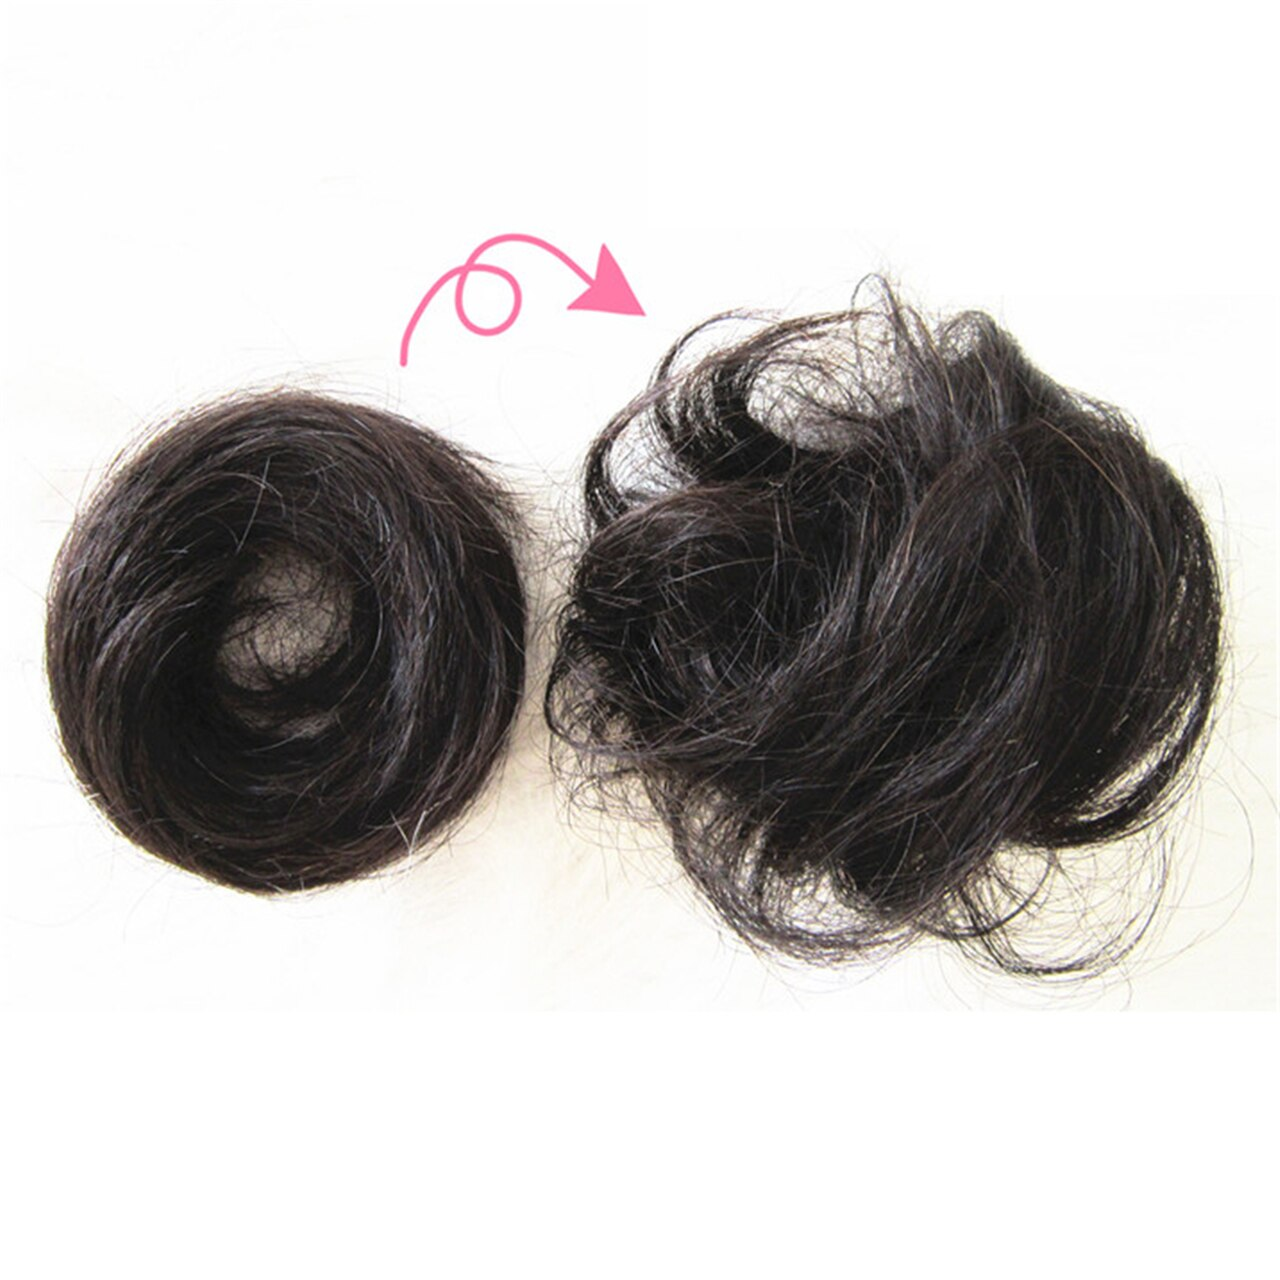 The Original Man Bun Instant Clip On Bun 100% Human Hair Extension 3